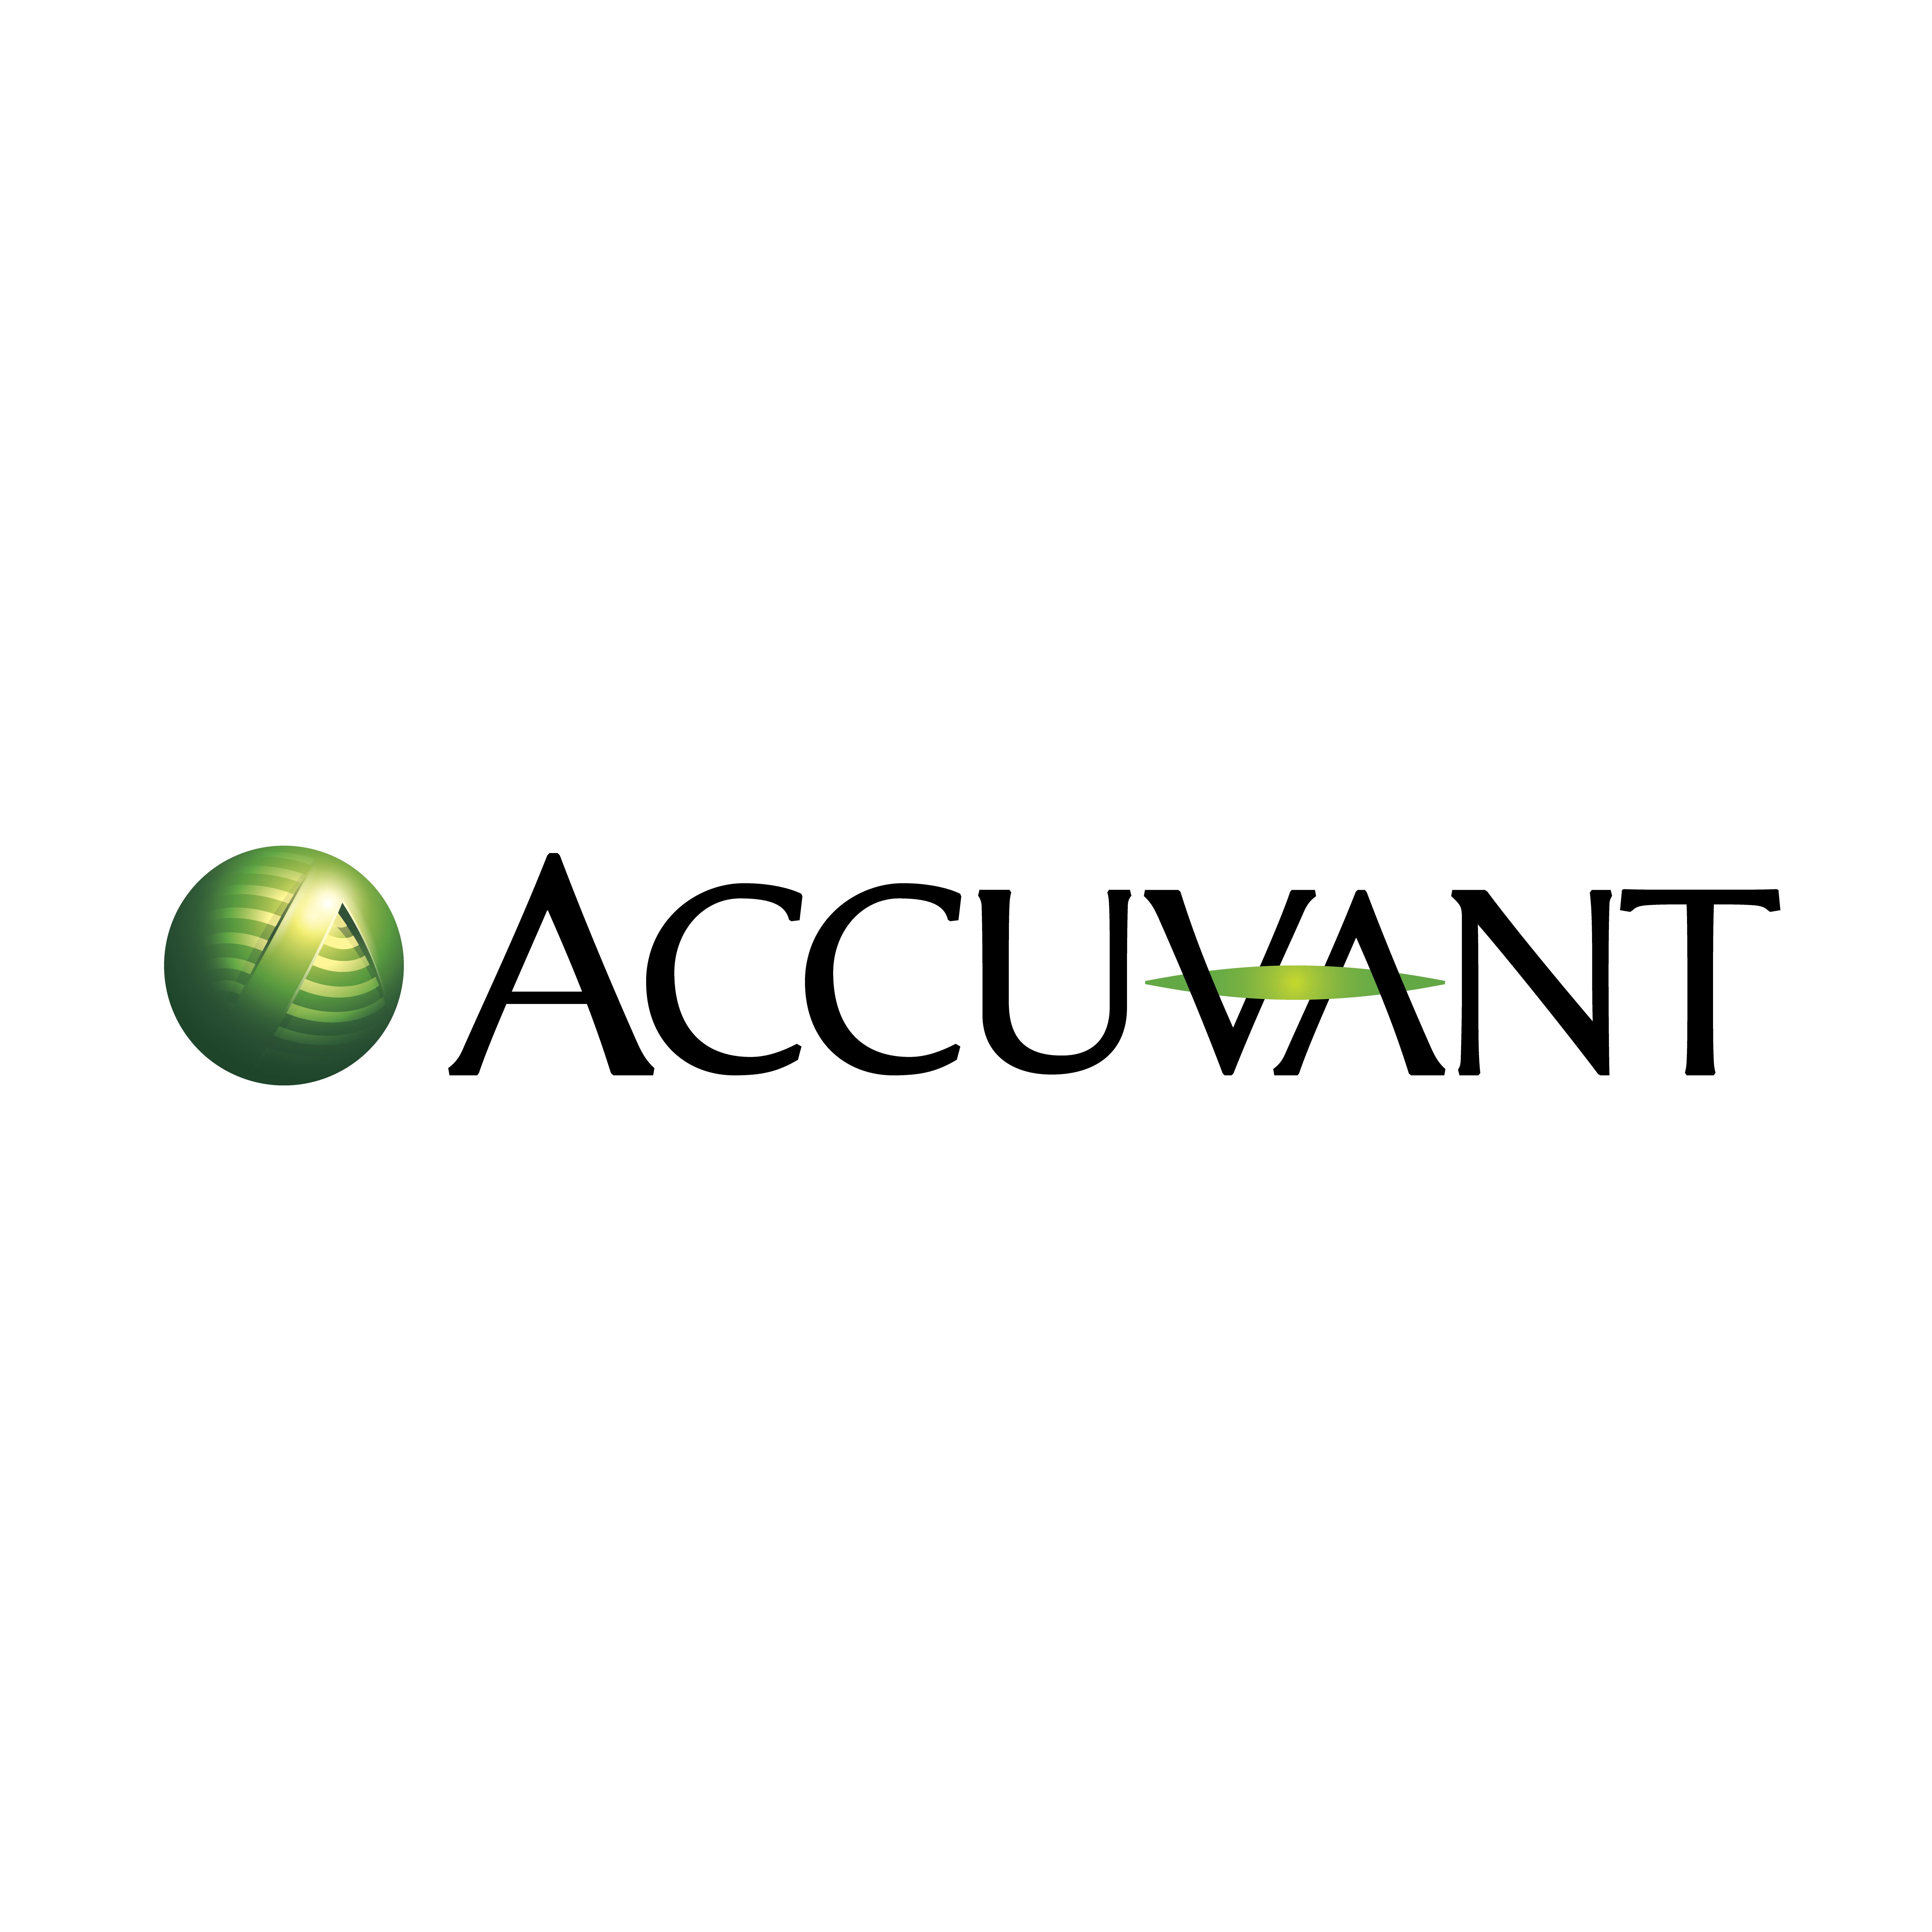 Accuvant | crunchbase